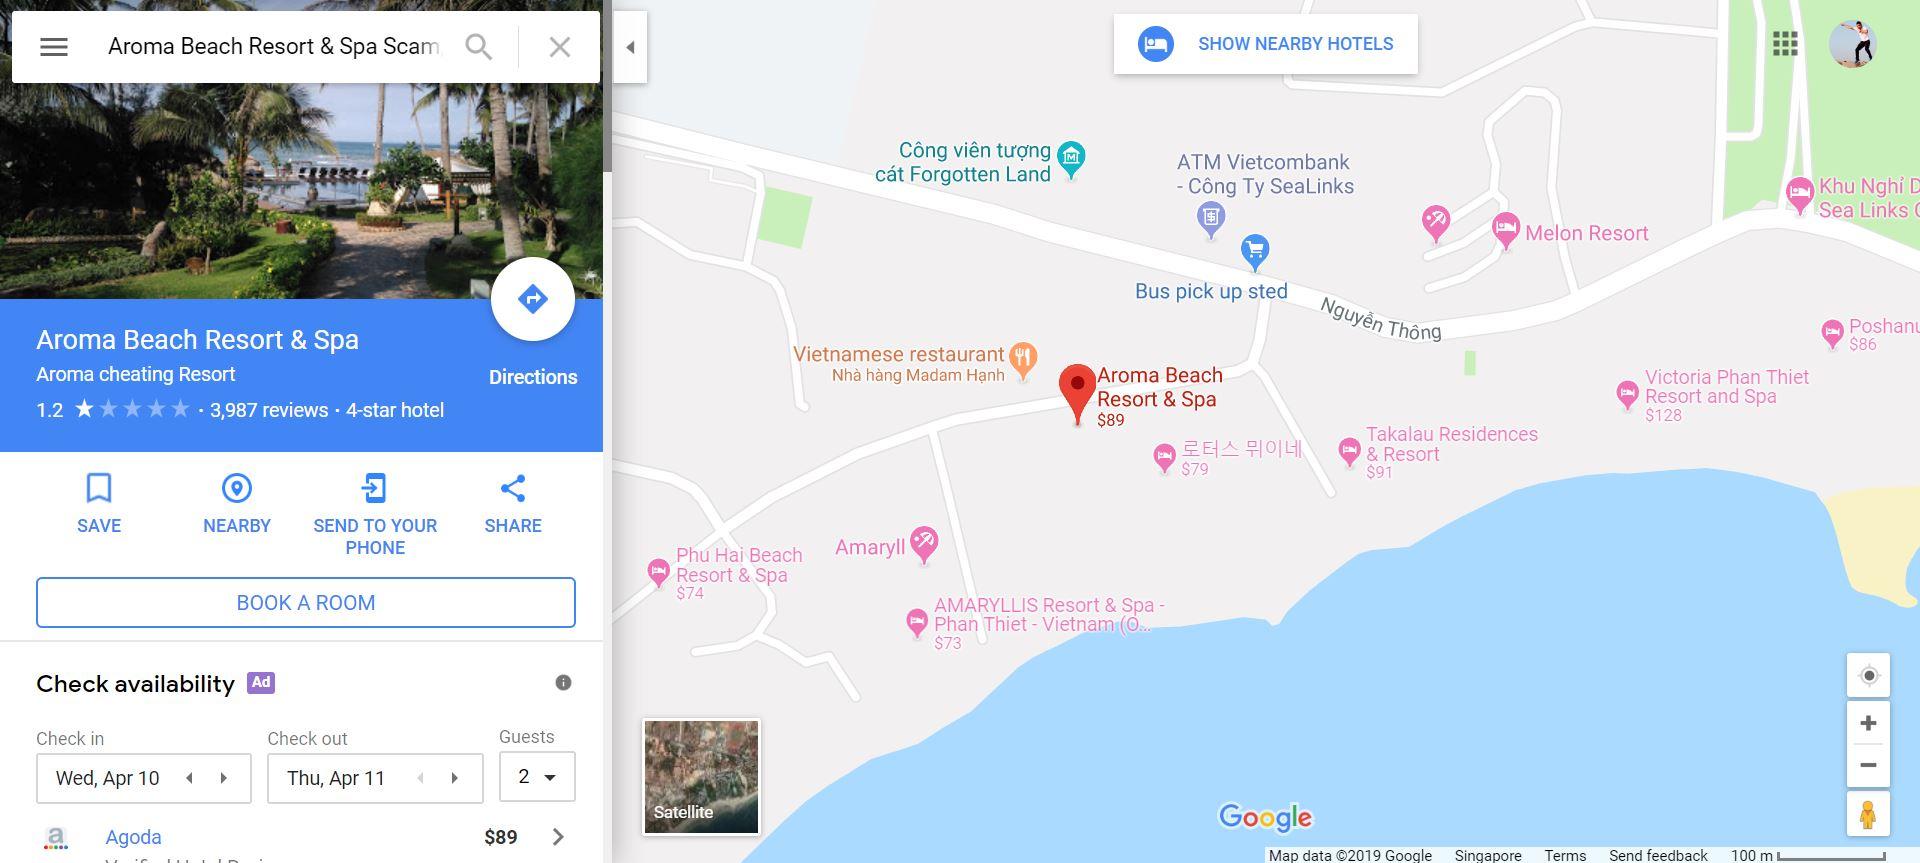 Diễn biến sự việc Aroma Beach Resort